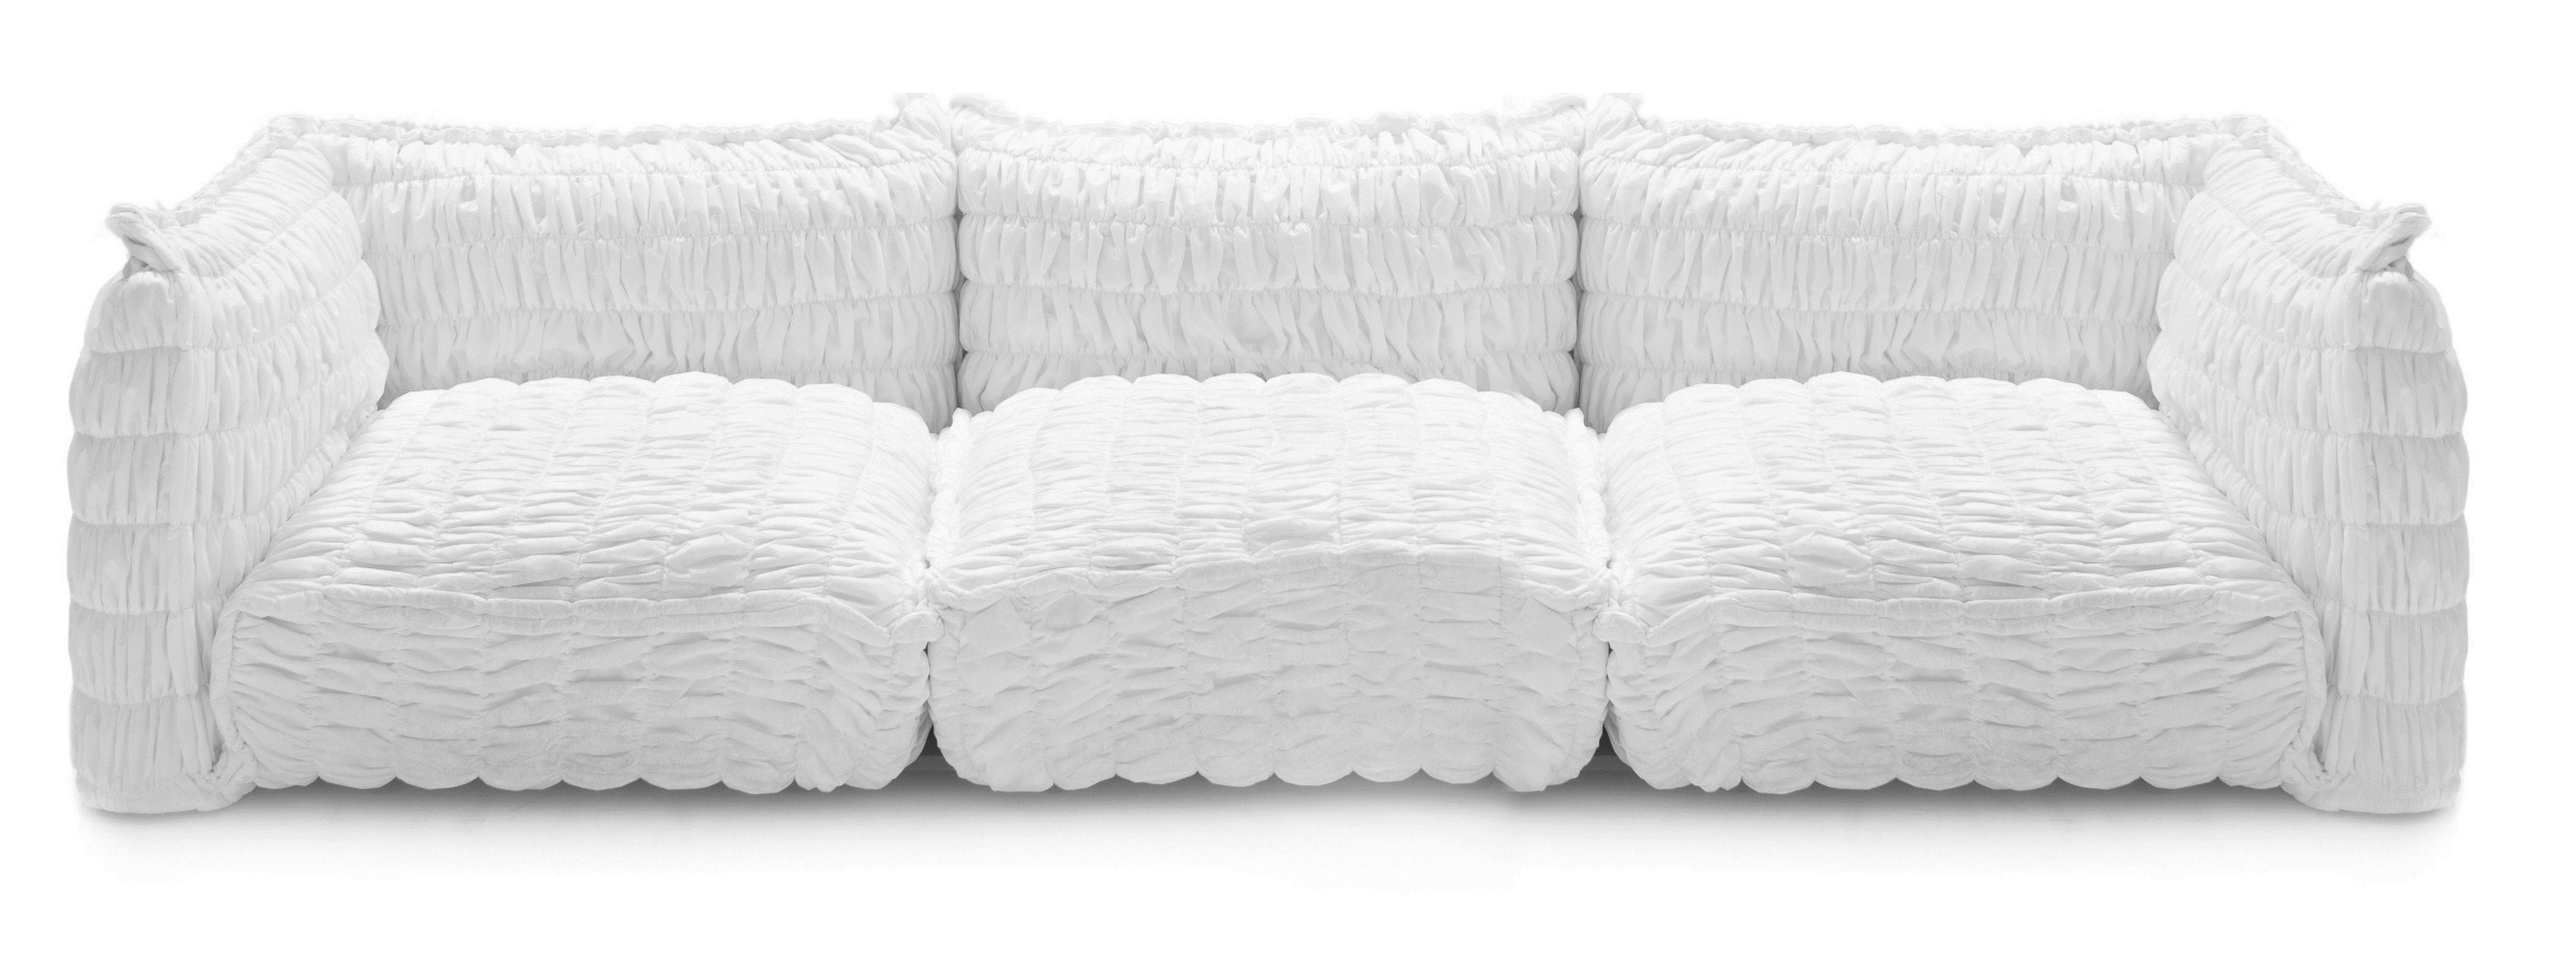 Aufblasbares Sofa  aufblasbares sofa